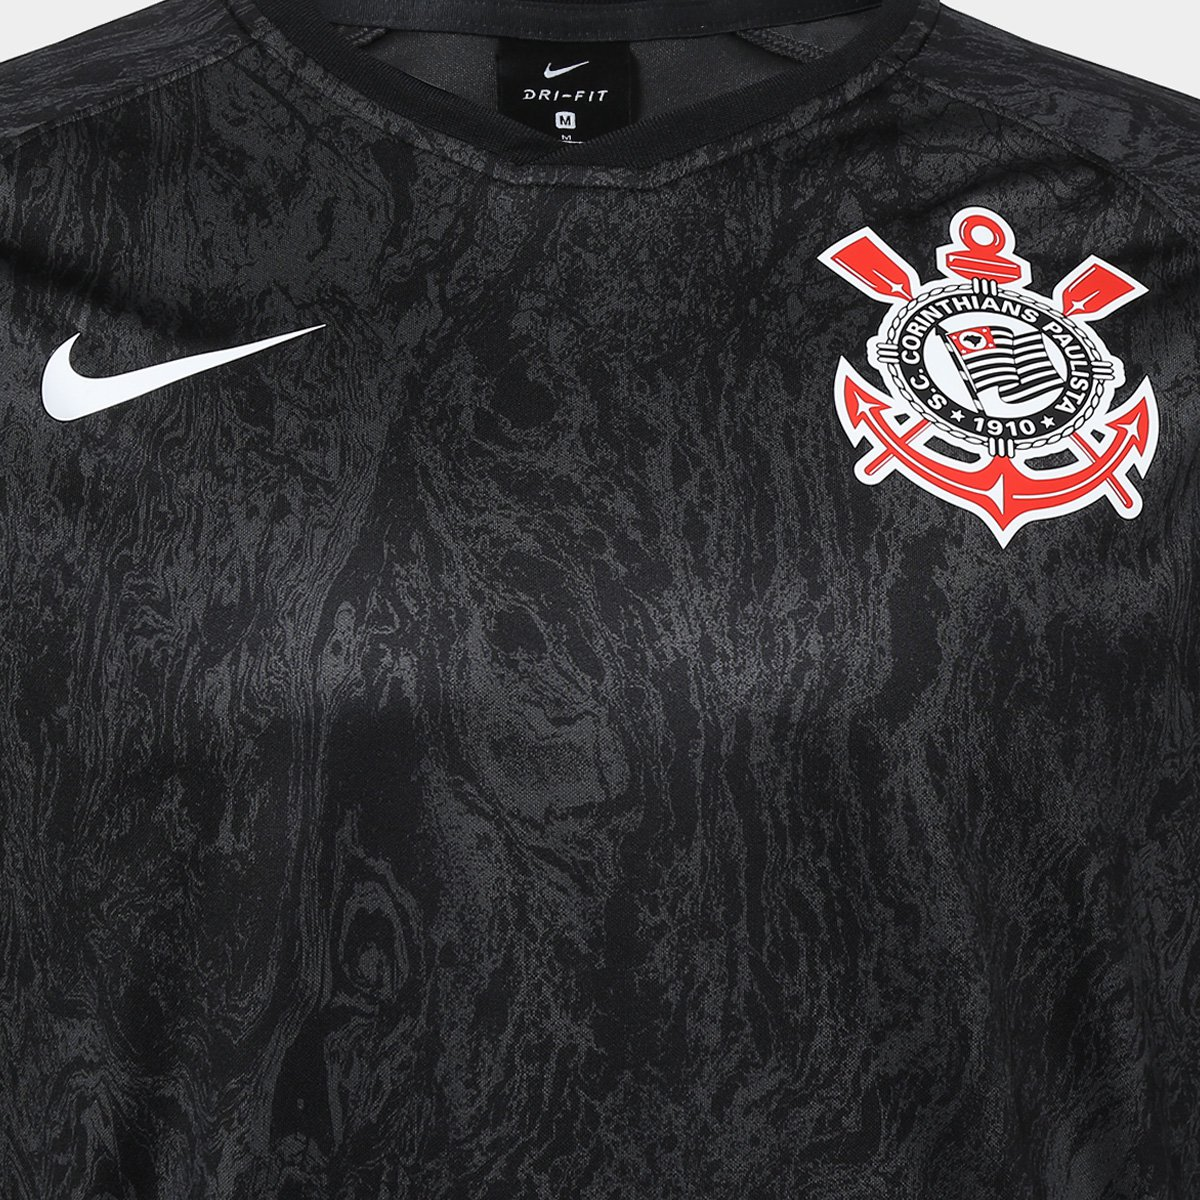 ac34794e97 ... Camisa Corinthians II 2018 s n° - Torcedor Estádio Nike Masculina ...